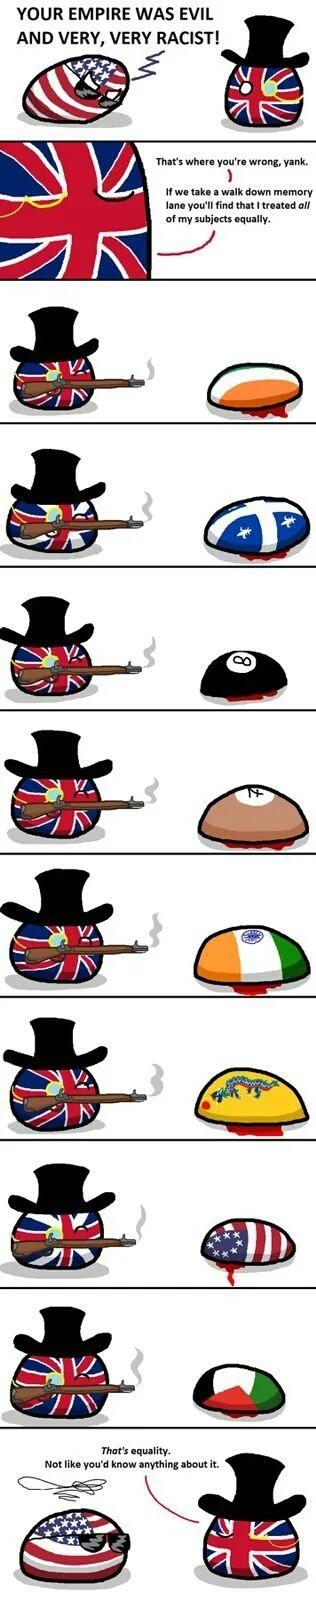 British equality - meme